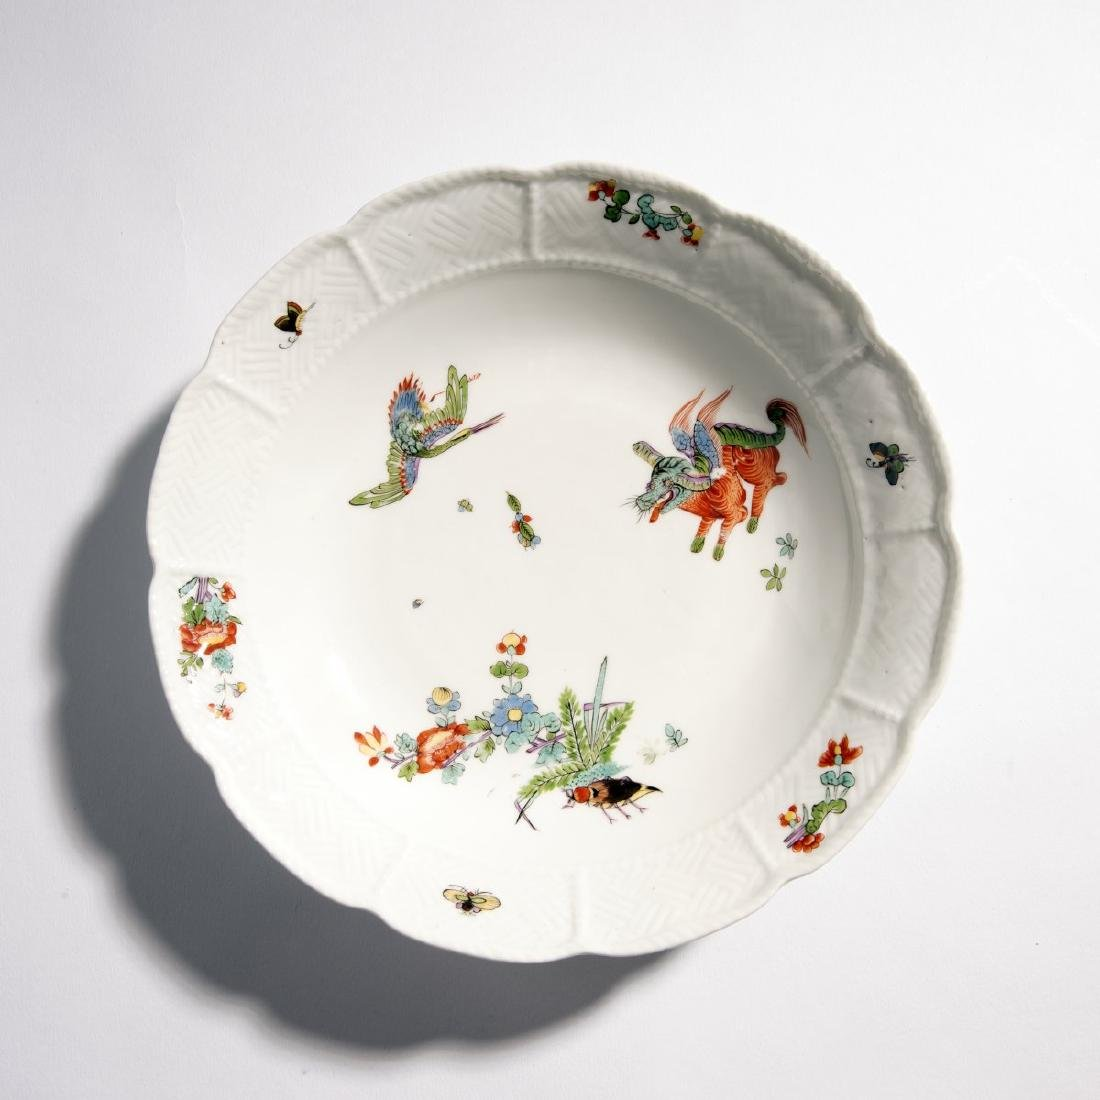 KPM Meissen, Bowl 'Flying Dog', c. 1730